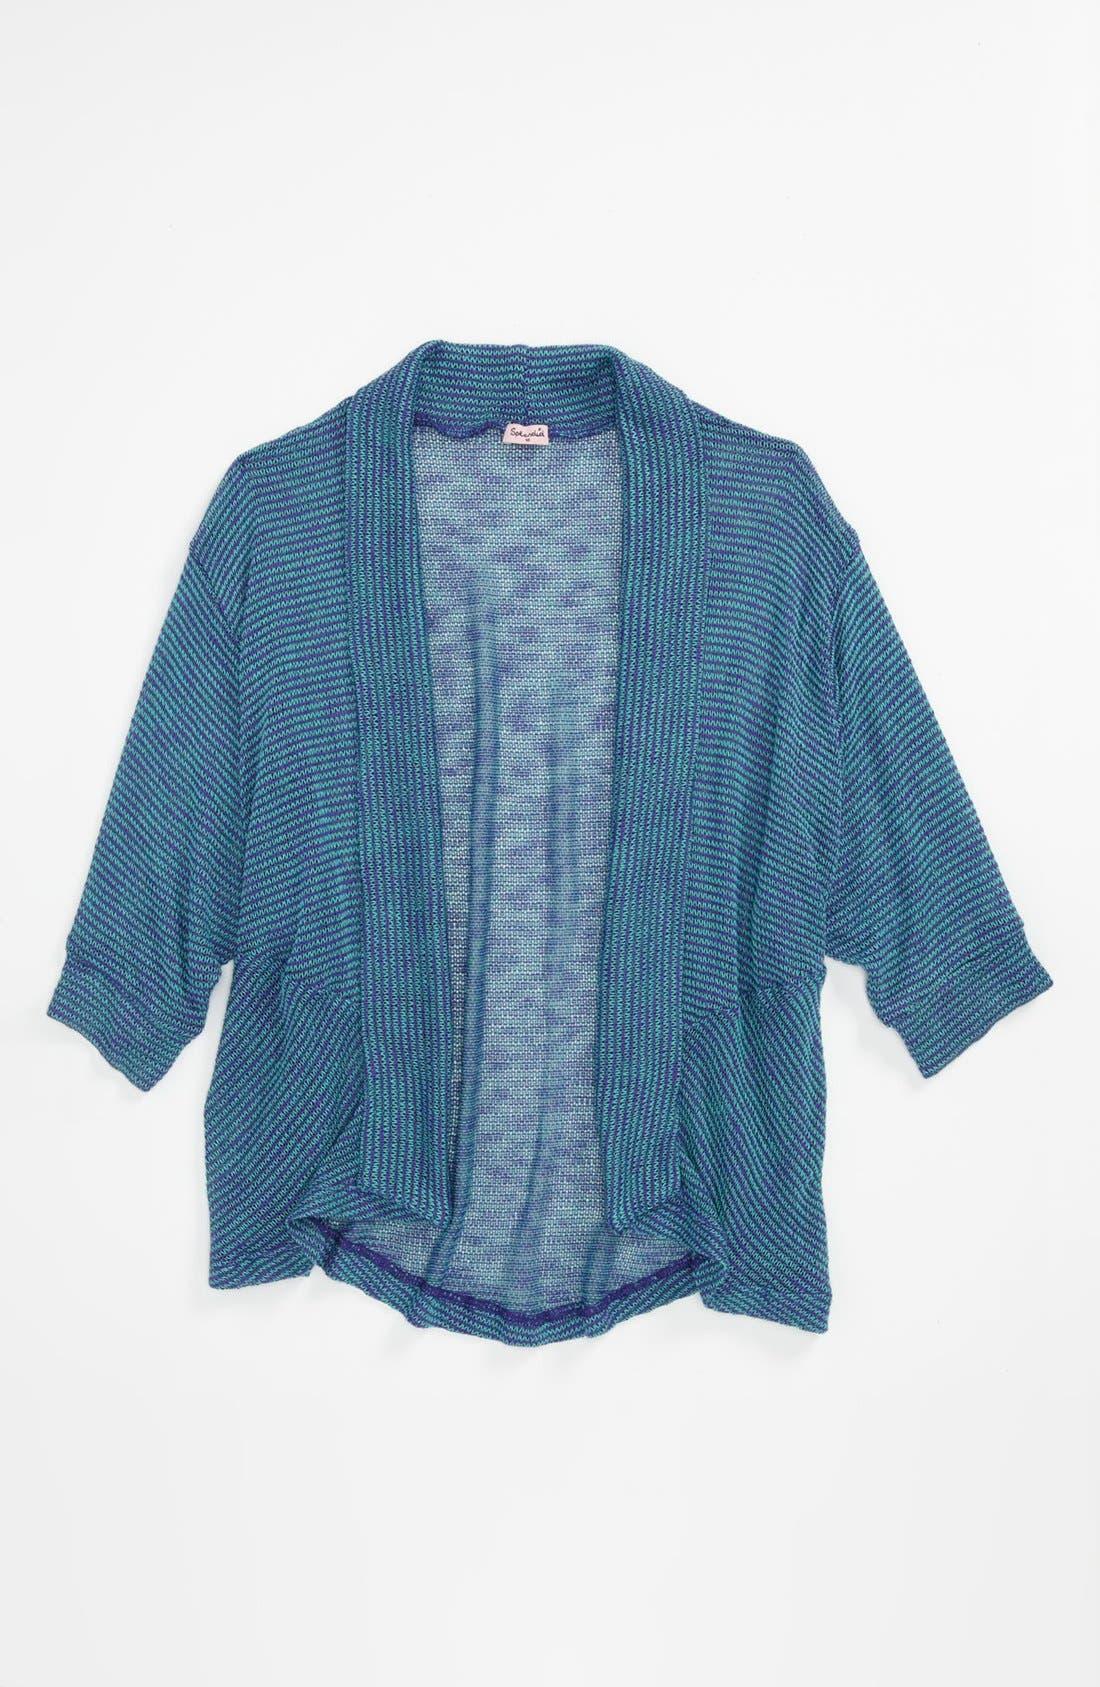 Alternate Image 1 Selected - Splendid 'Beachglass' Knit Wrap (Big Girls)